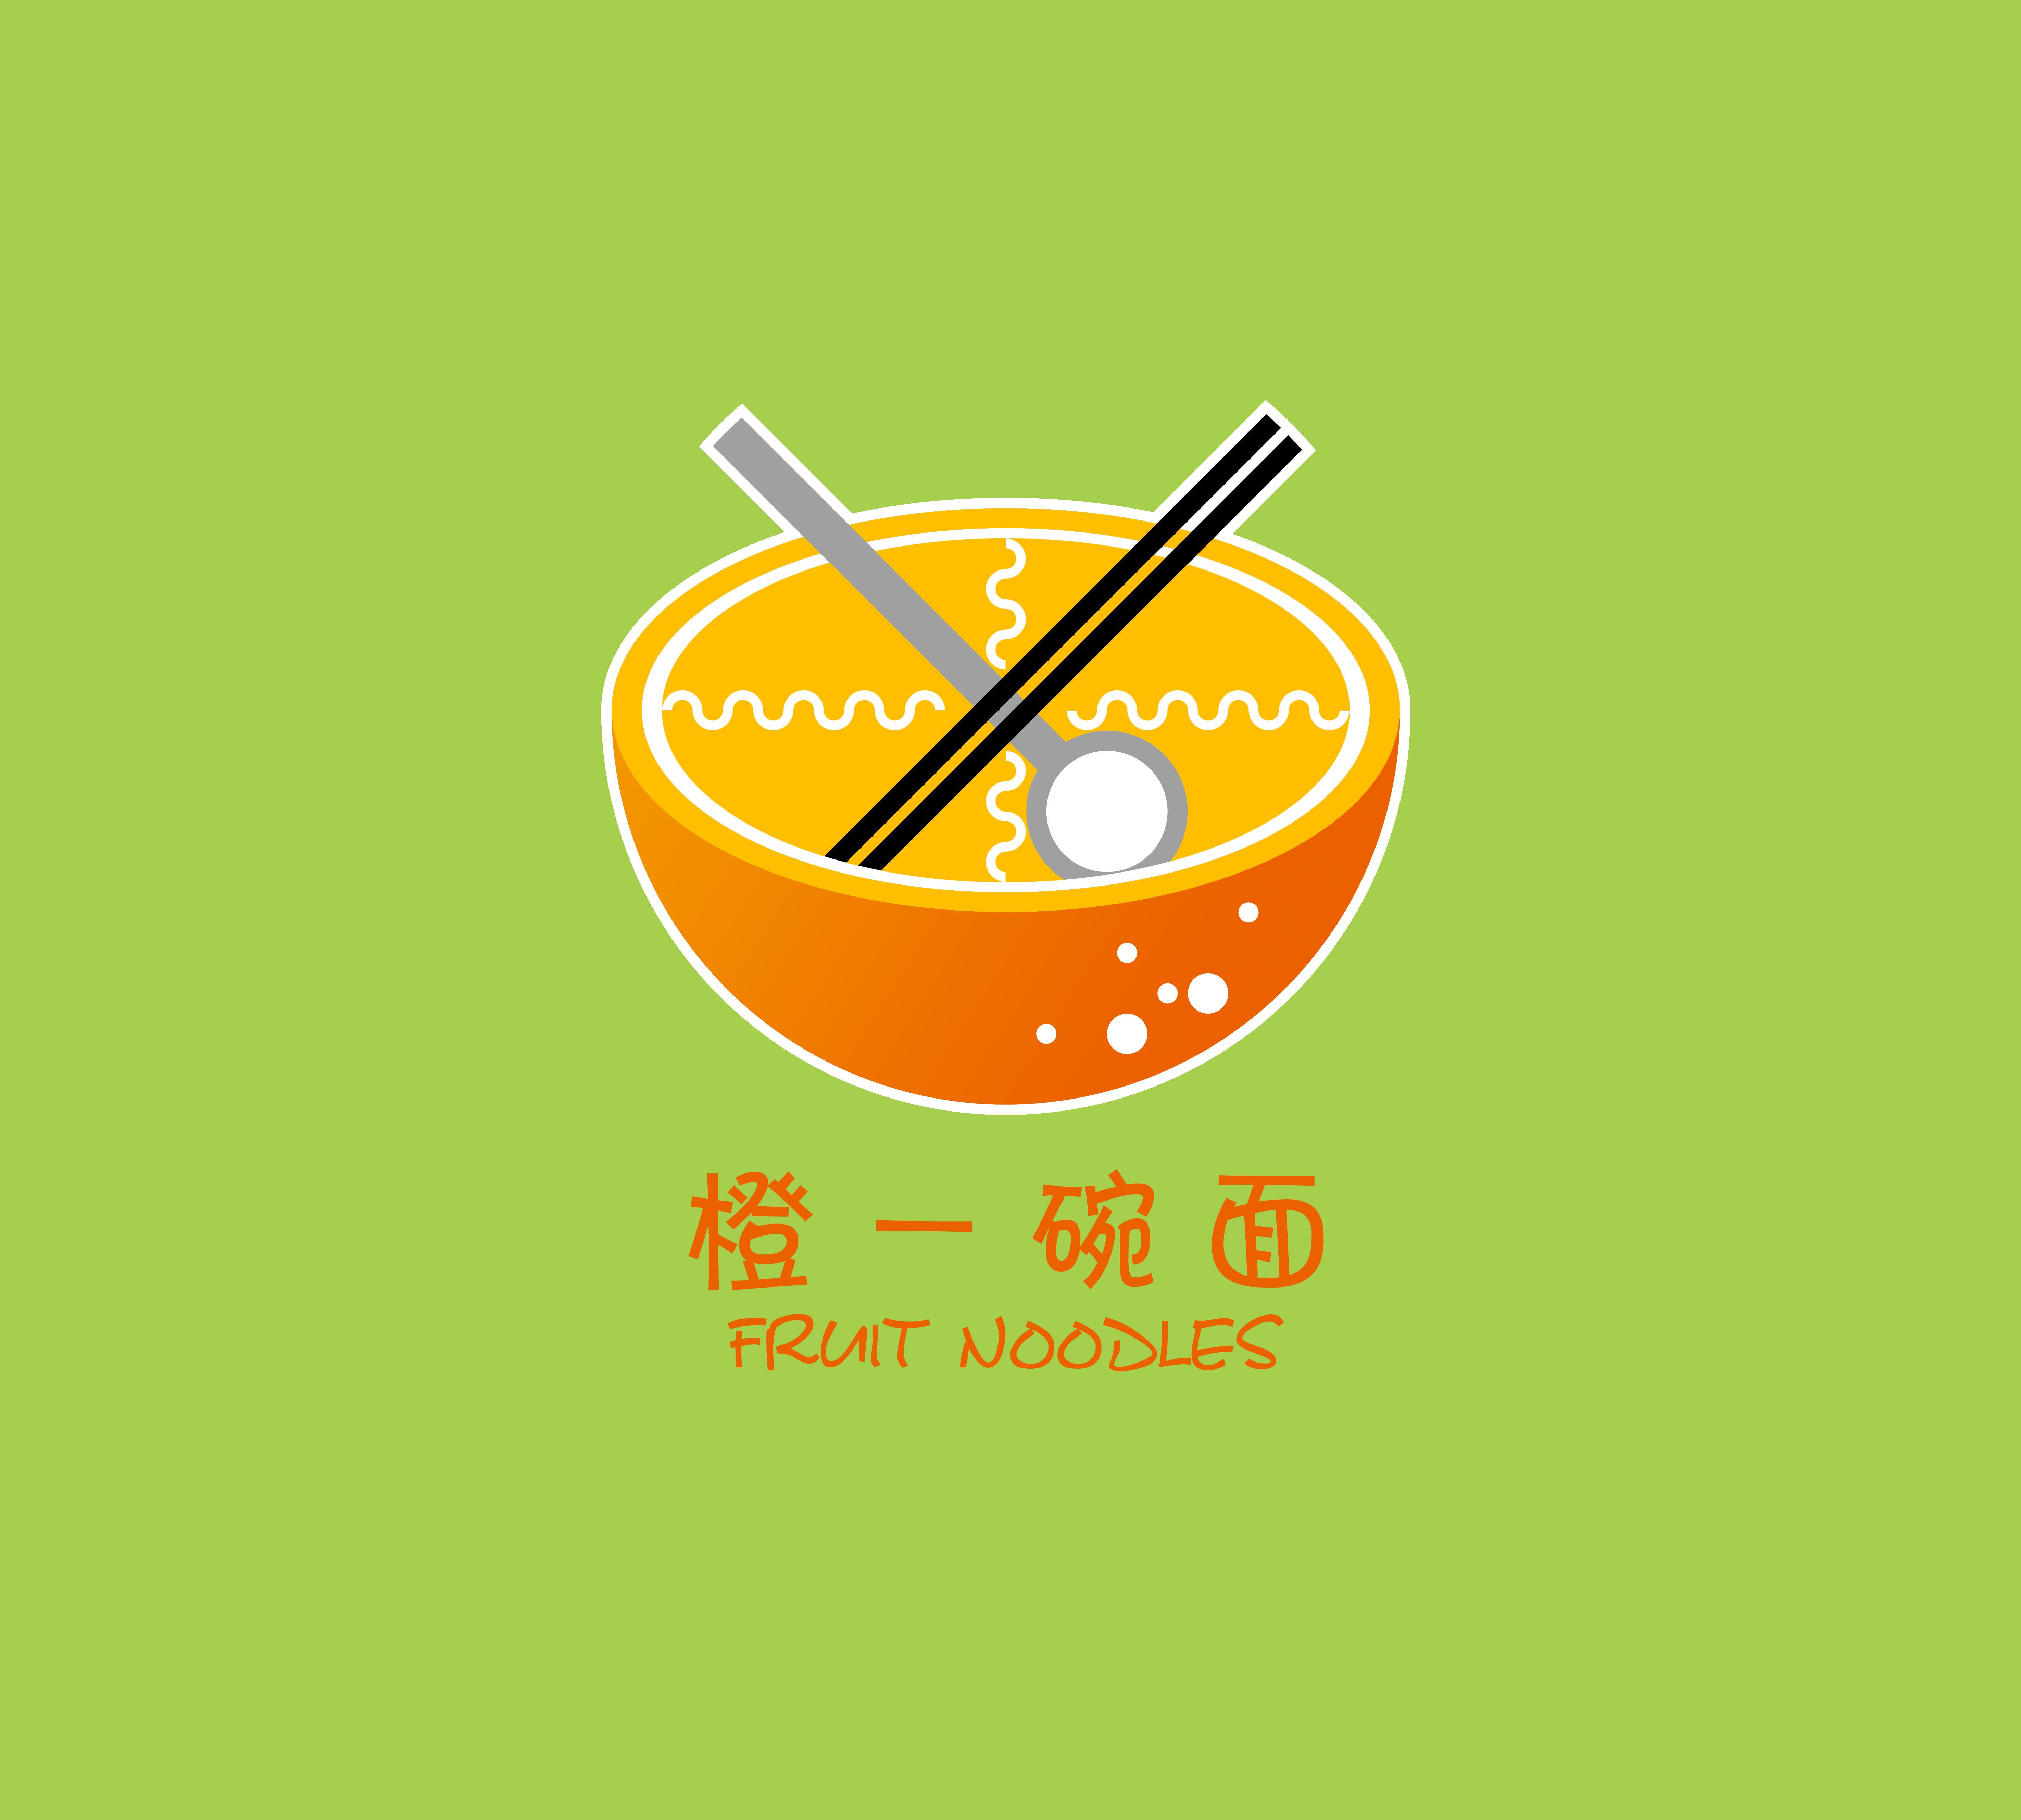 橙一碗面logo